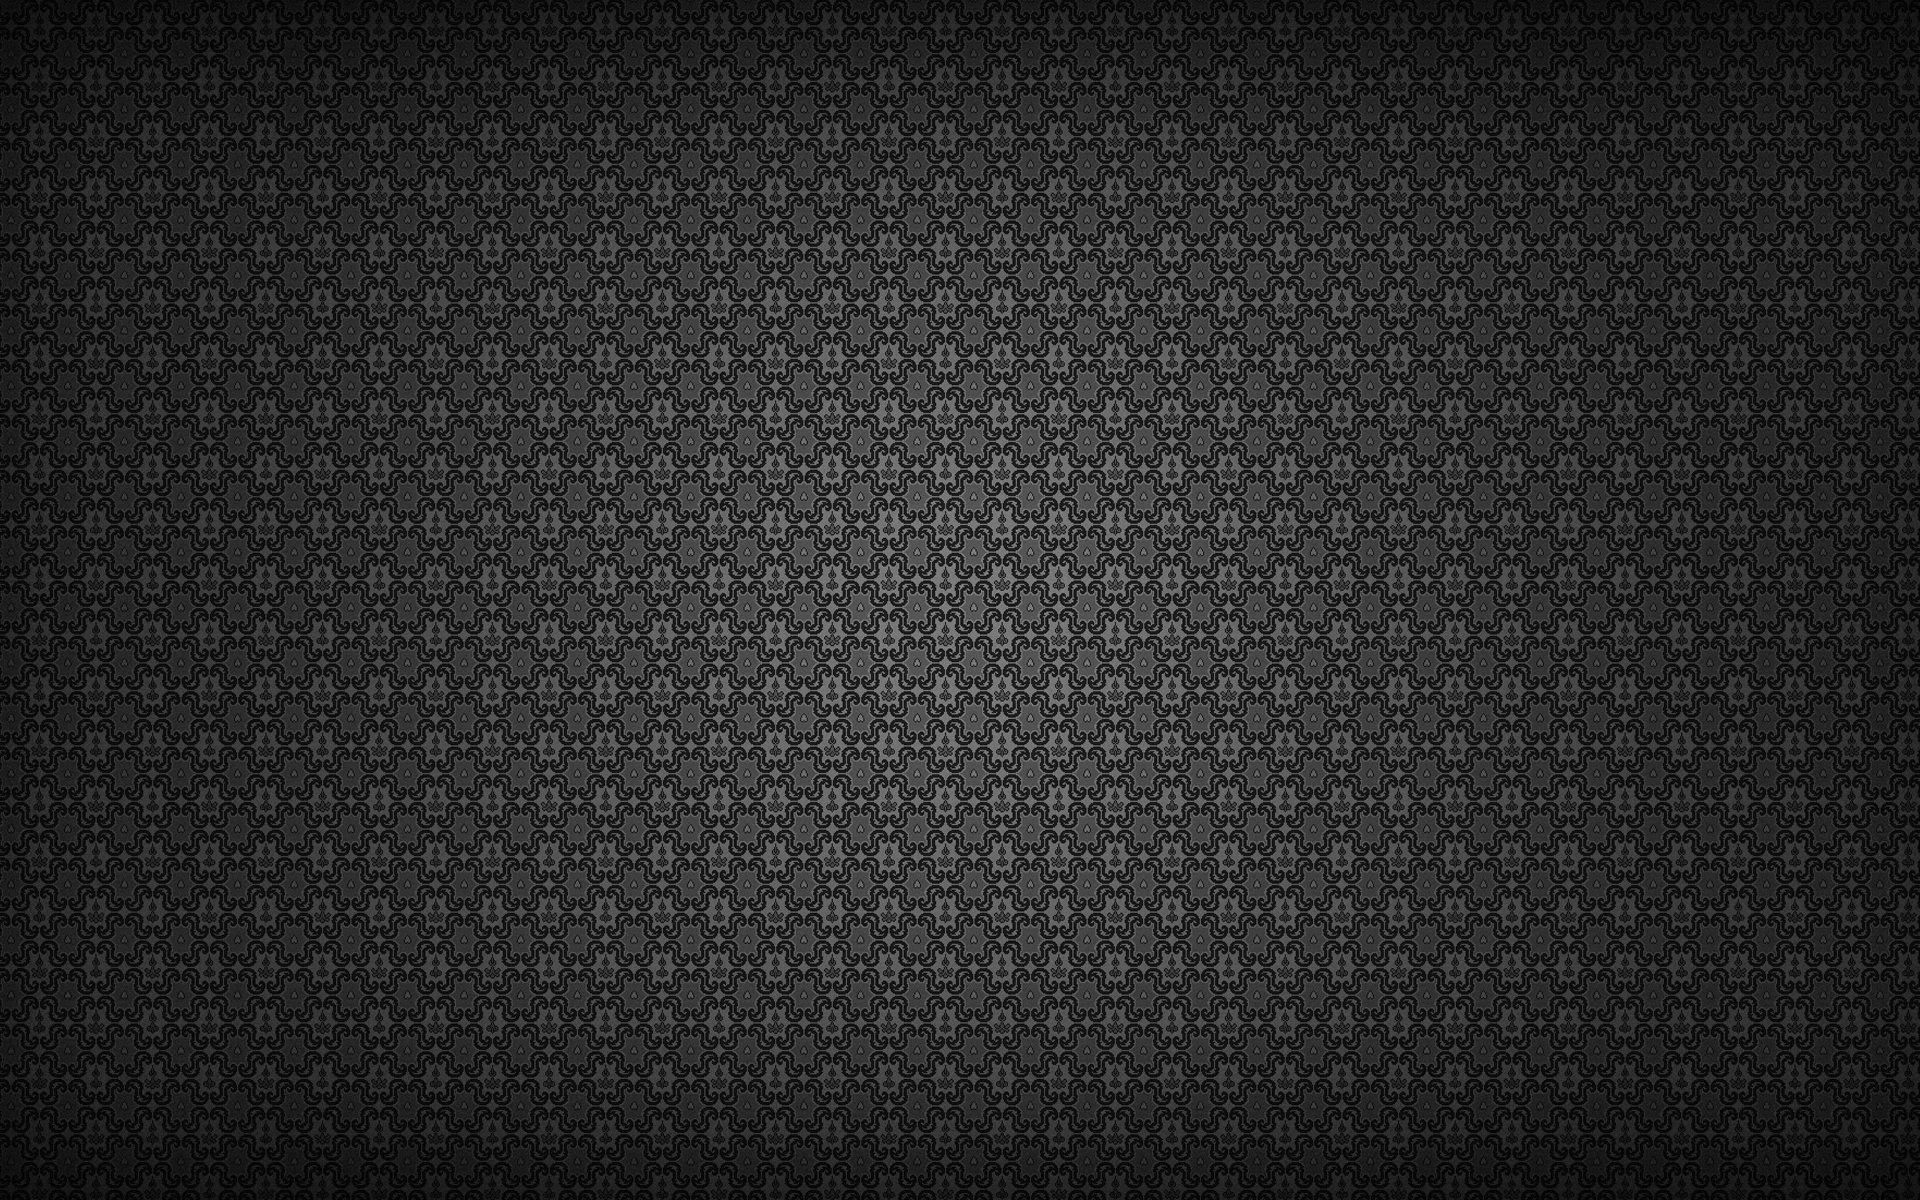 Police Car Website >> Texture Wallpaper Backgrounds - WallpaperSafari